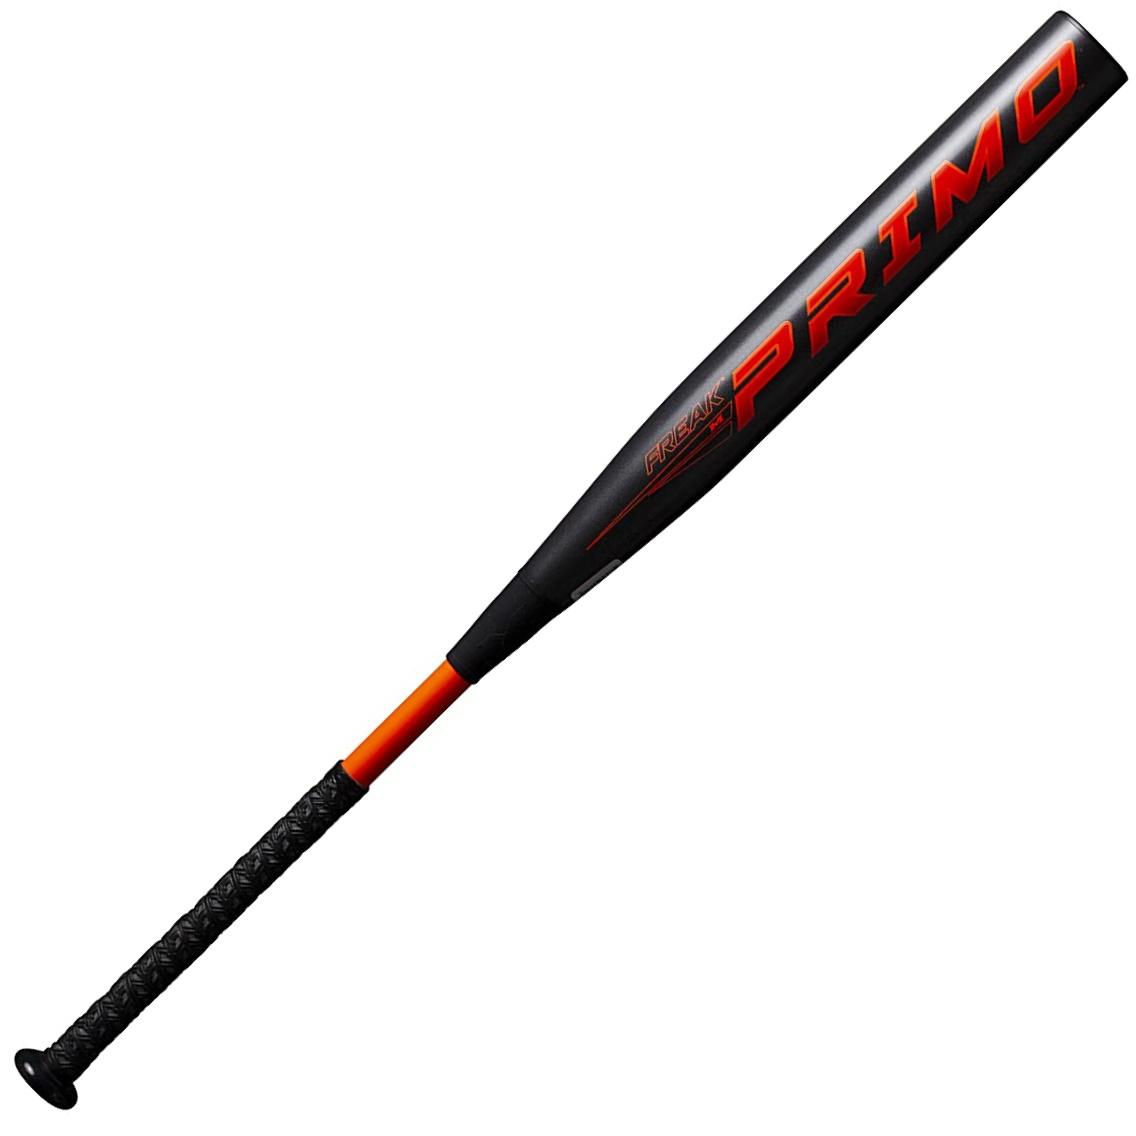 miken-freak-primo-14-usa-asa-maxload-slowpitch-softball-bat-34-inch-28-oz MP21MA-3-28